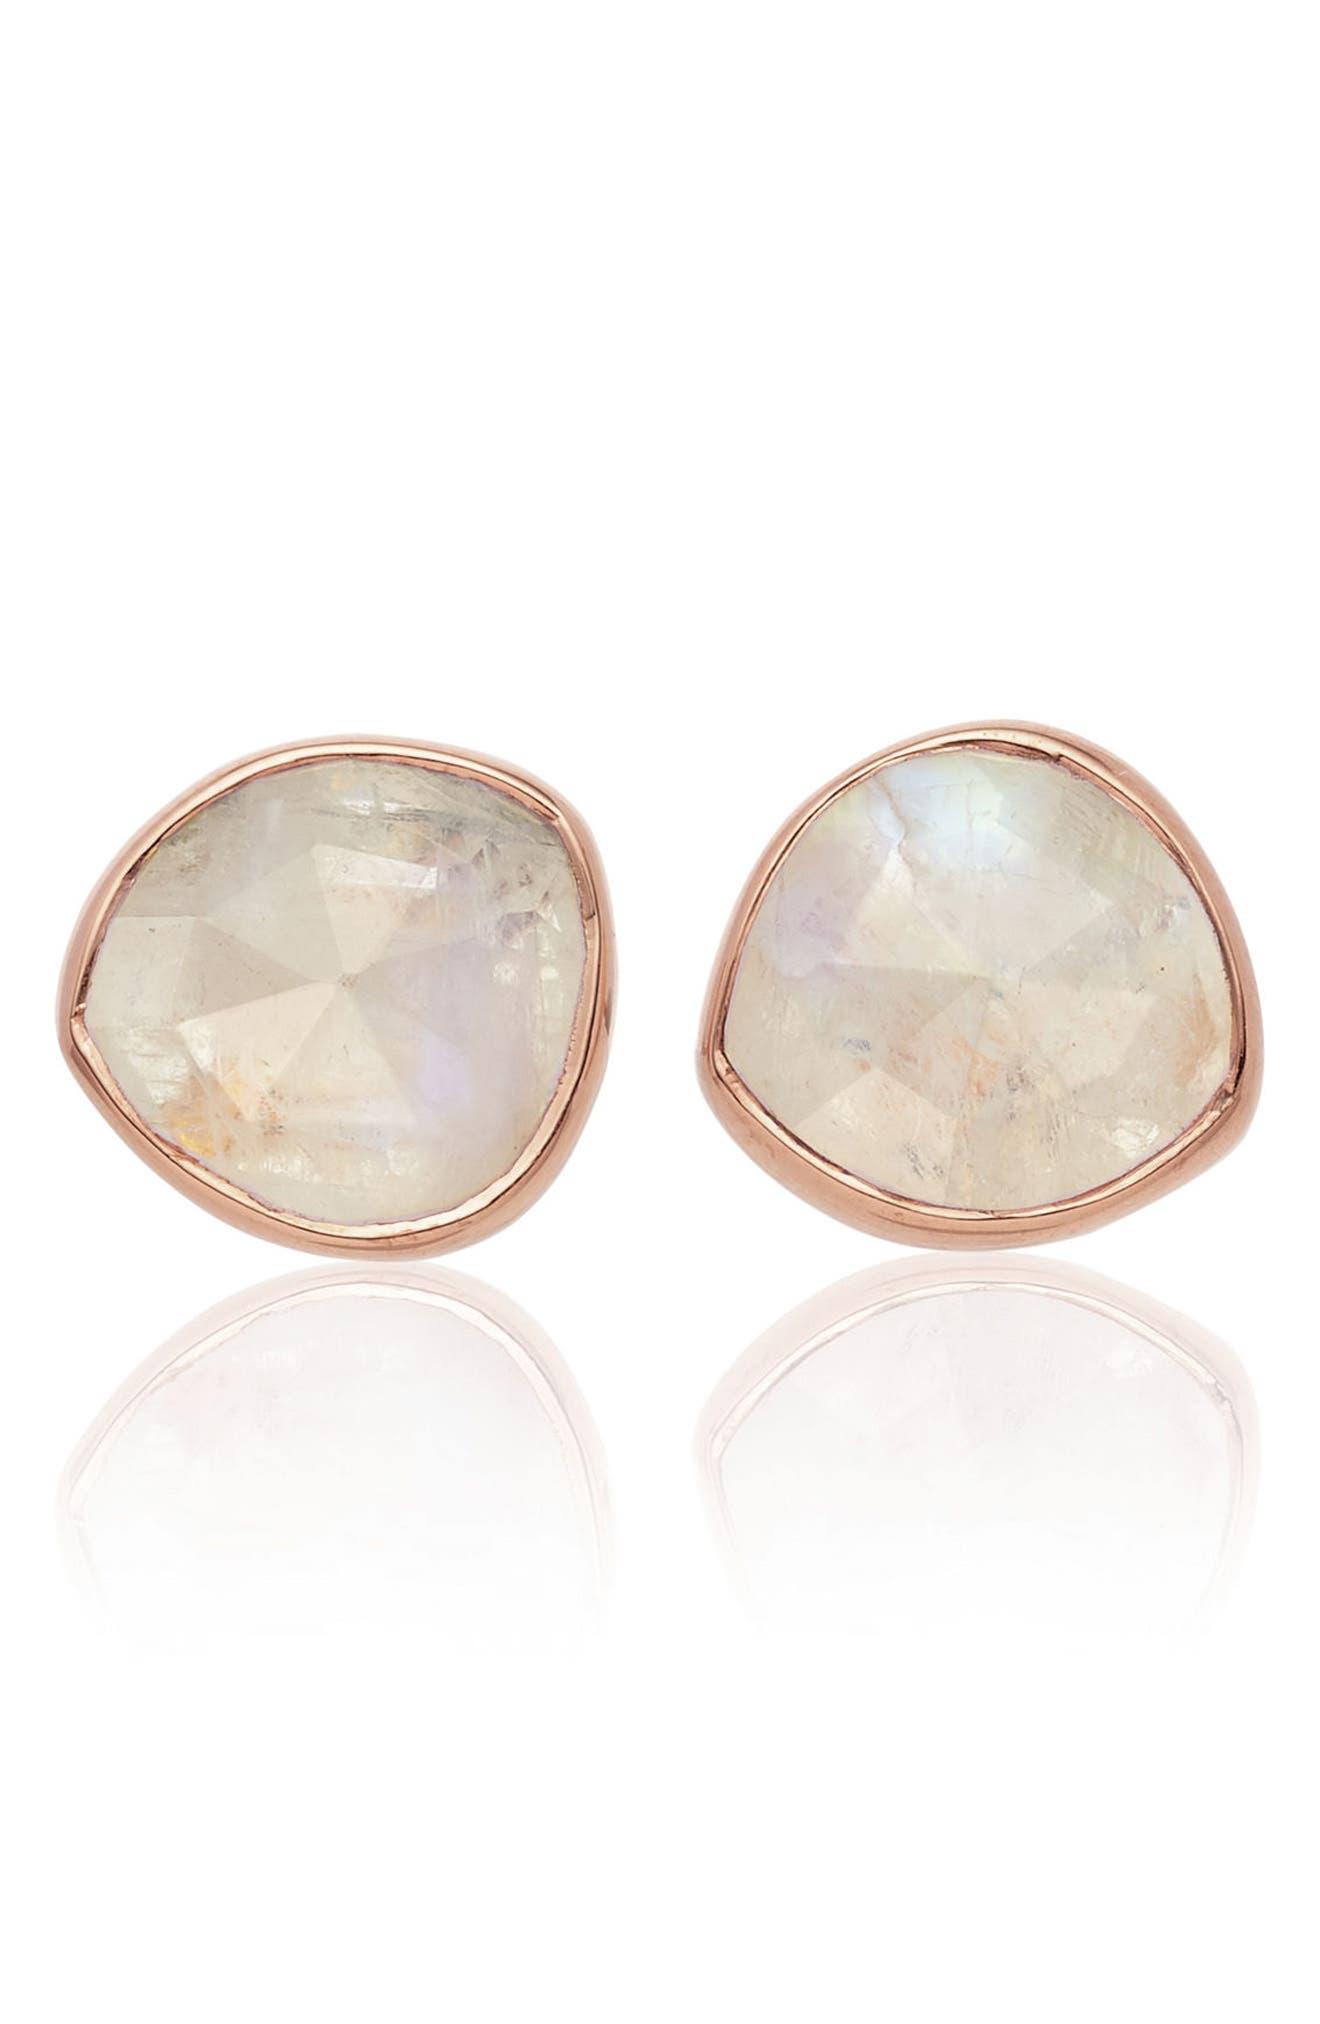 Monica Vinader Jewelry Nordstrom